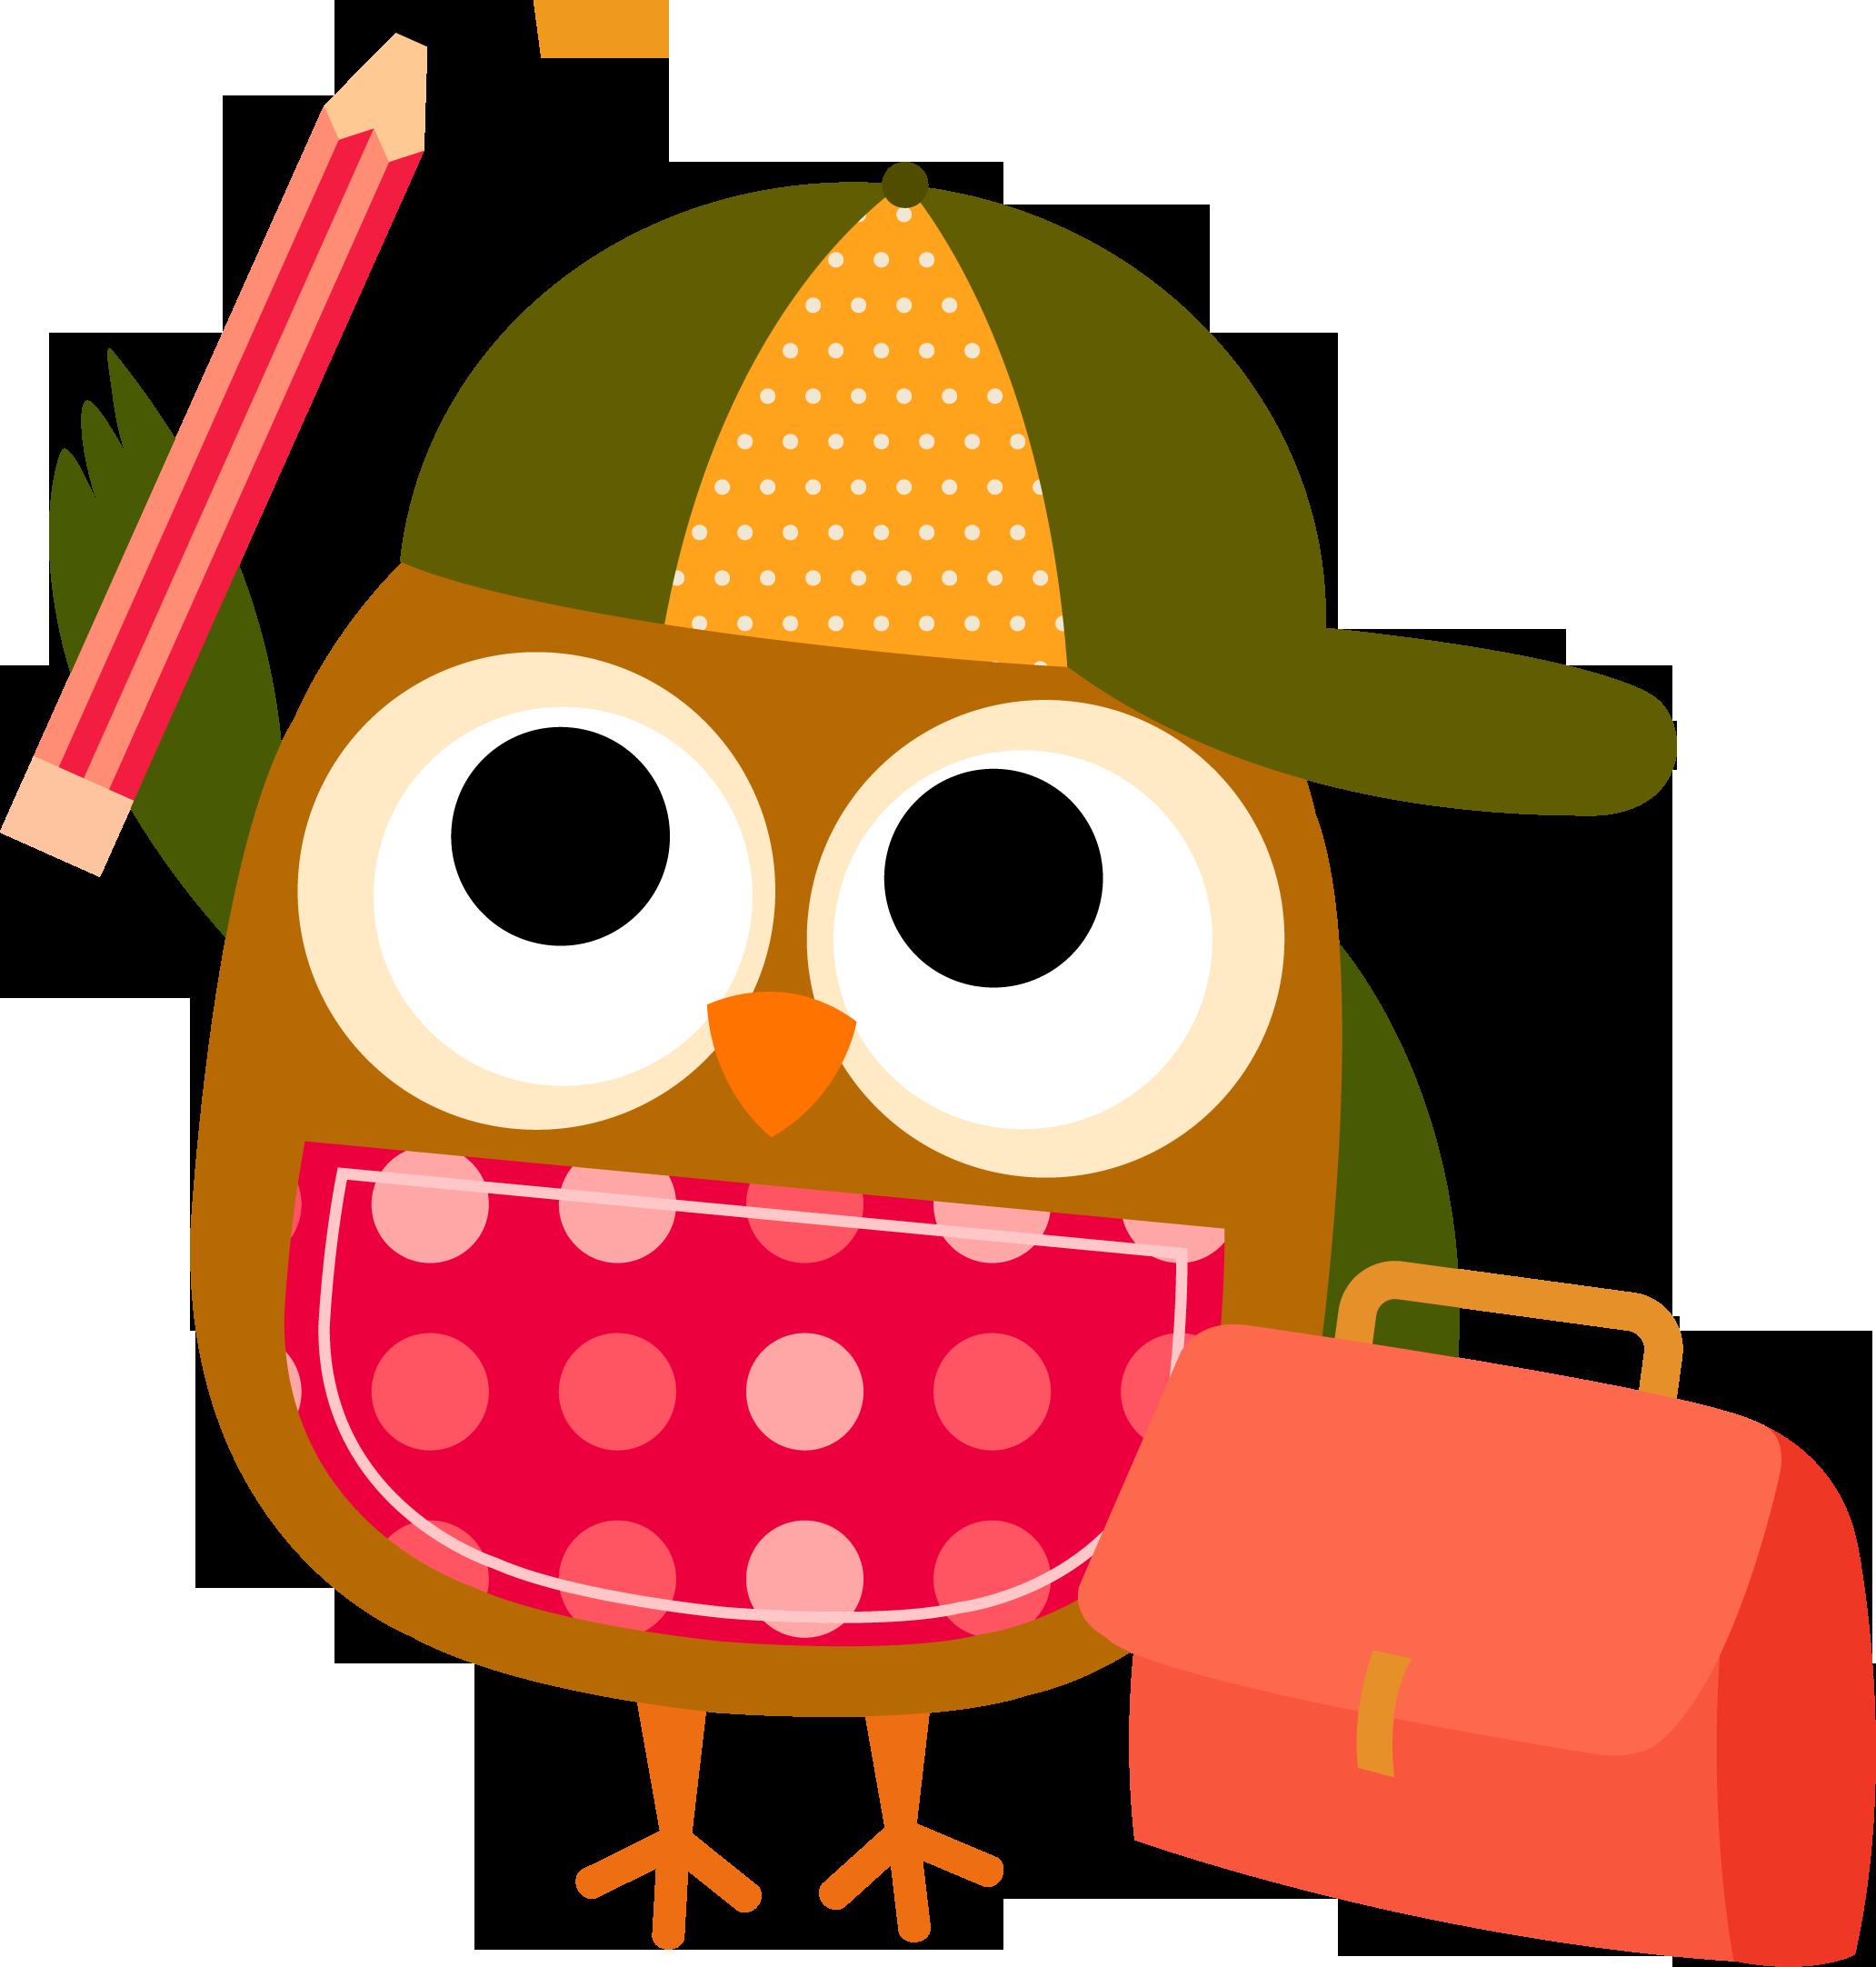 Free Owl School Clipart, Download Free Clip Art, Free Clip.